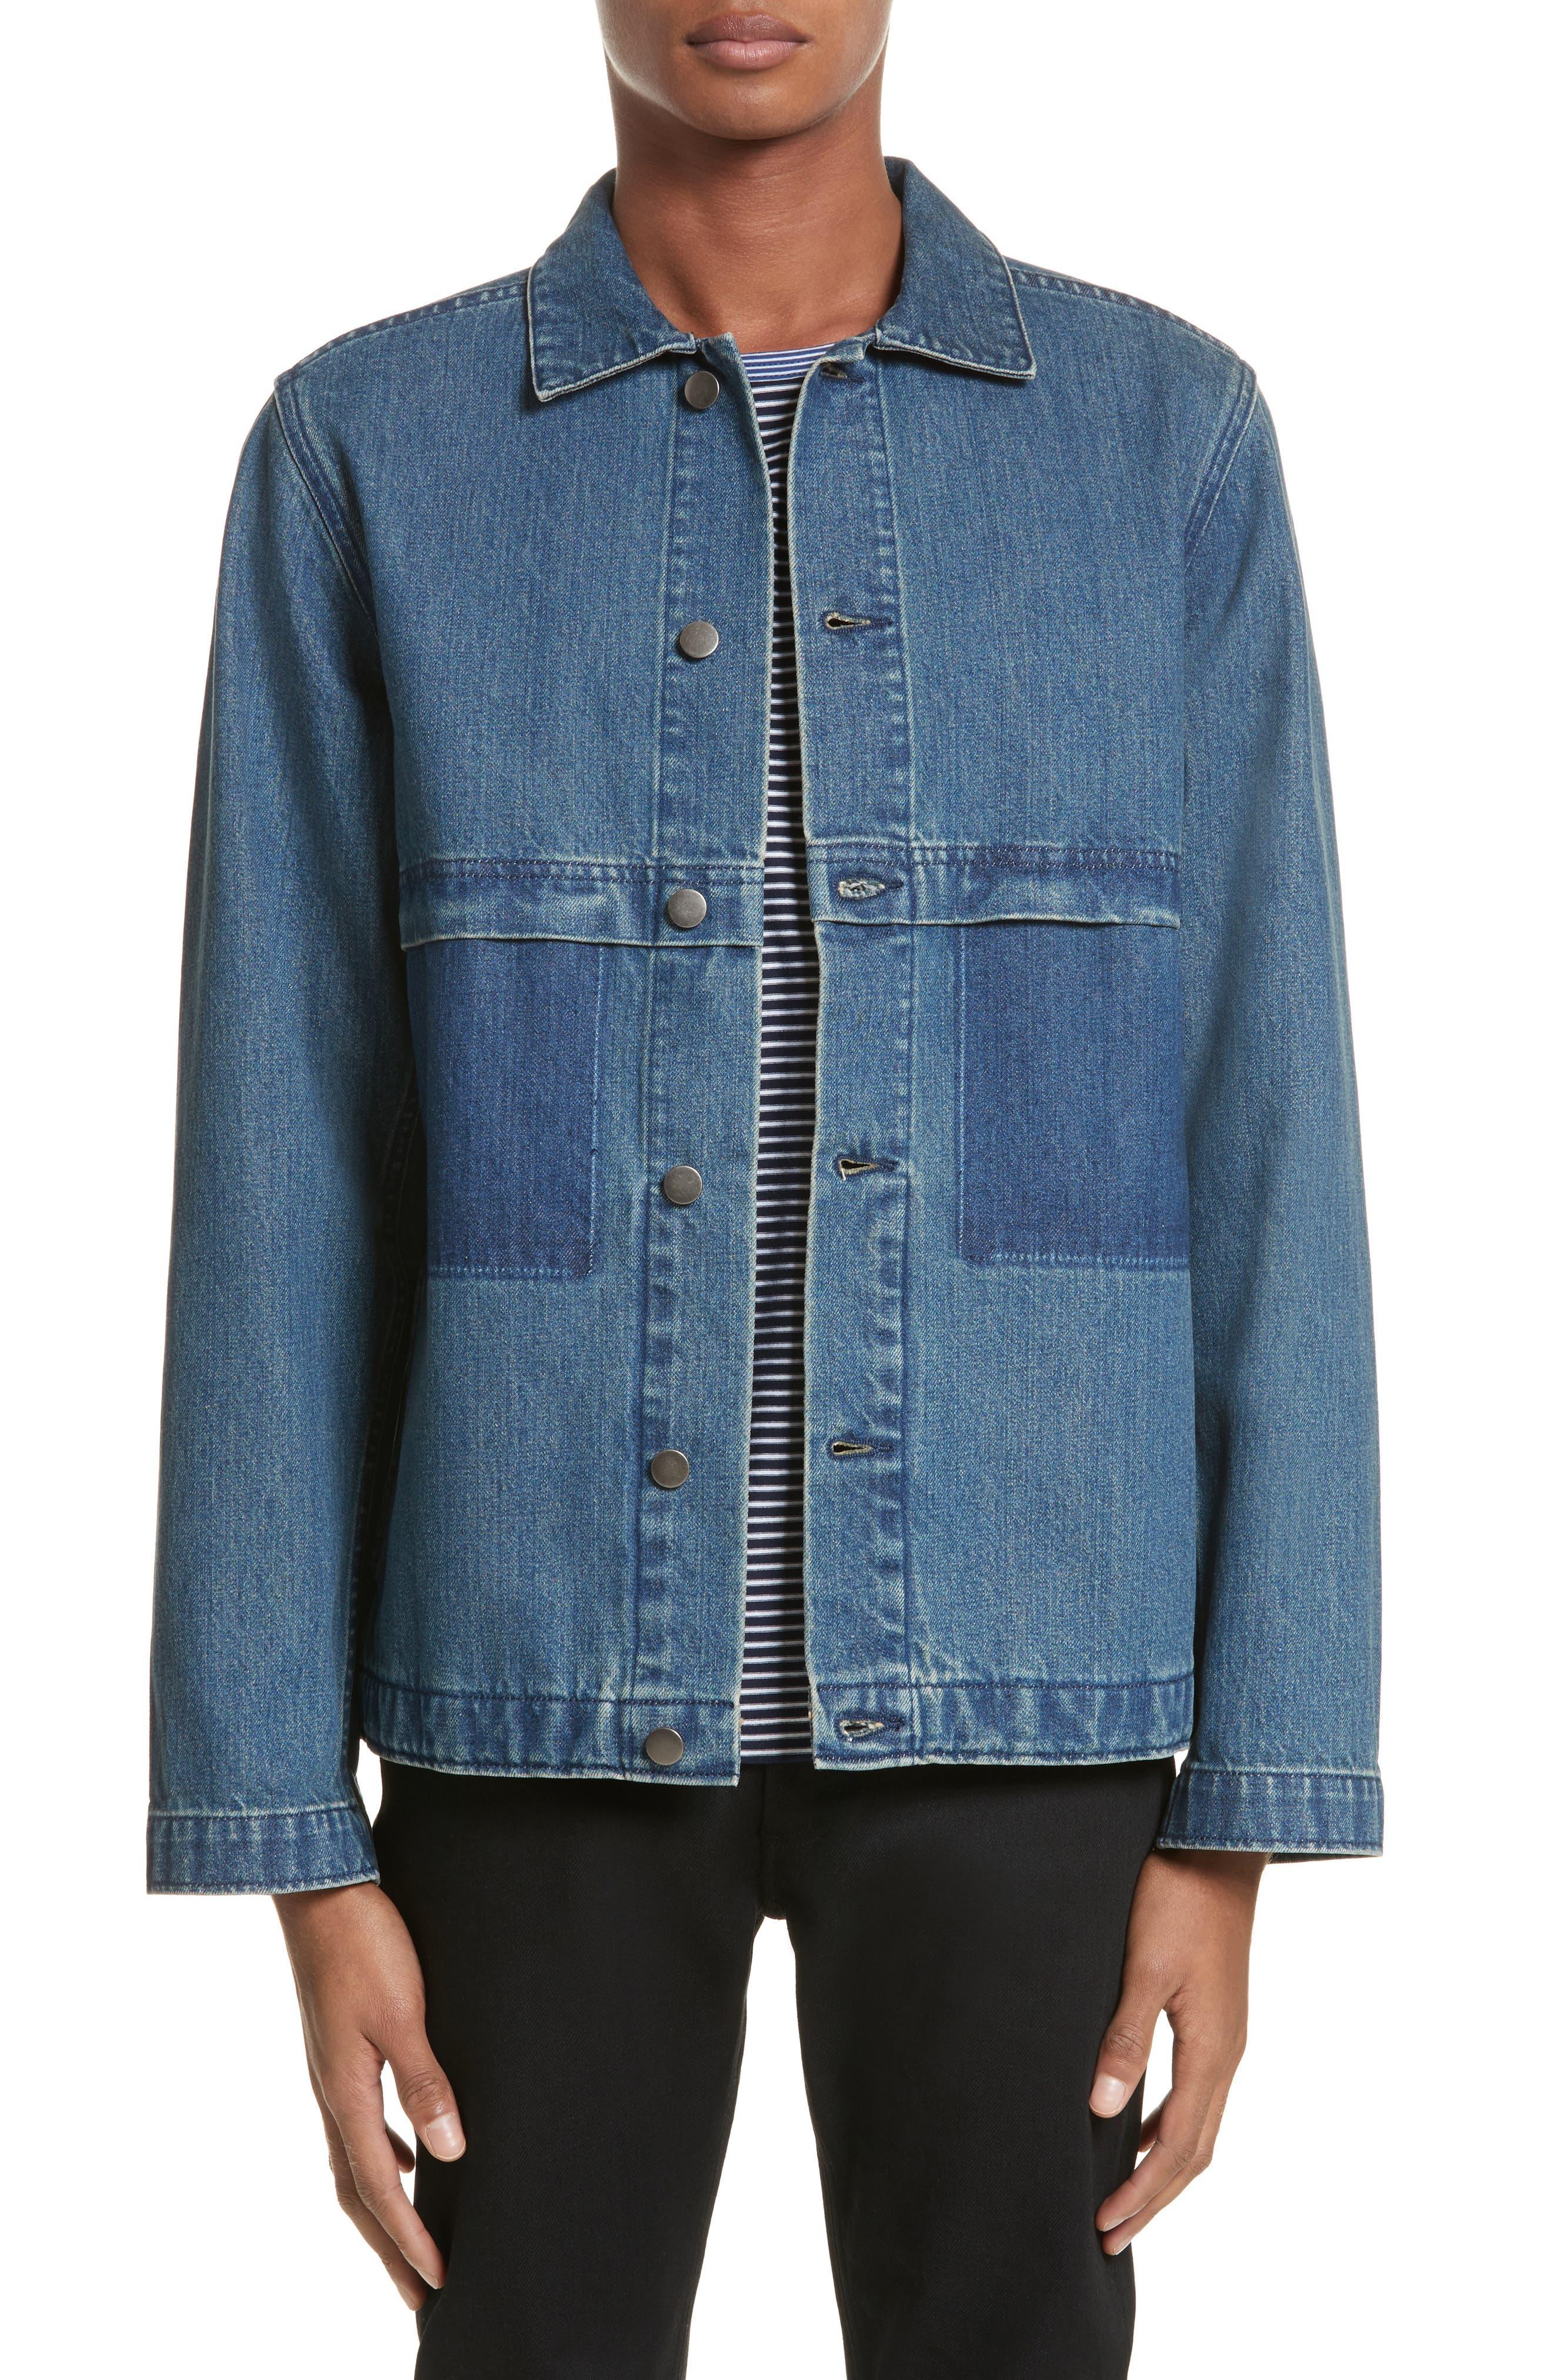 Smith Denim Jacket,                             Main thumbnail 1, color,                             Indigo Delave Ial